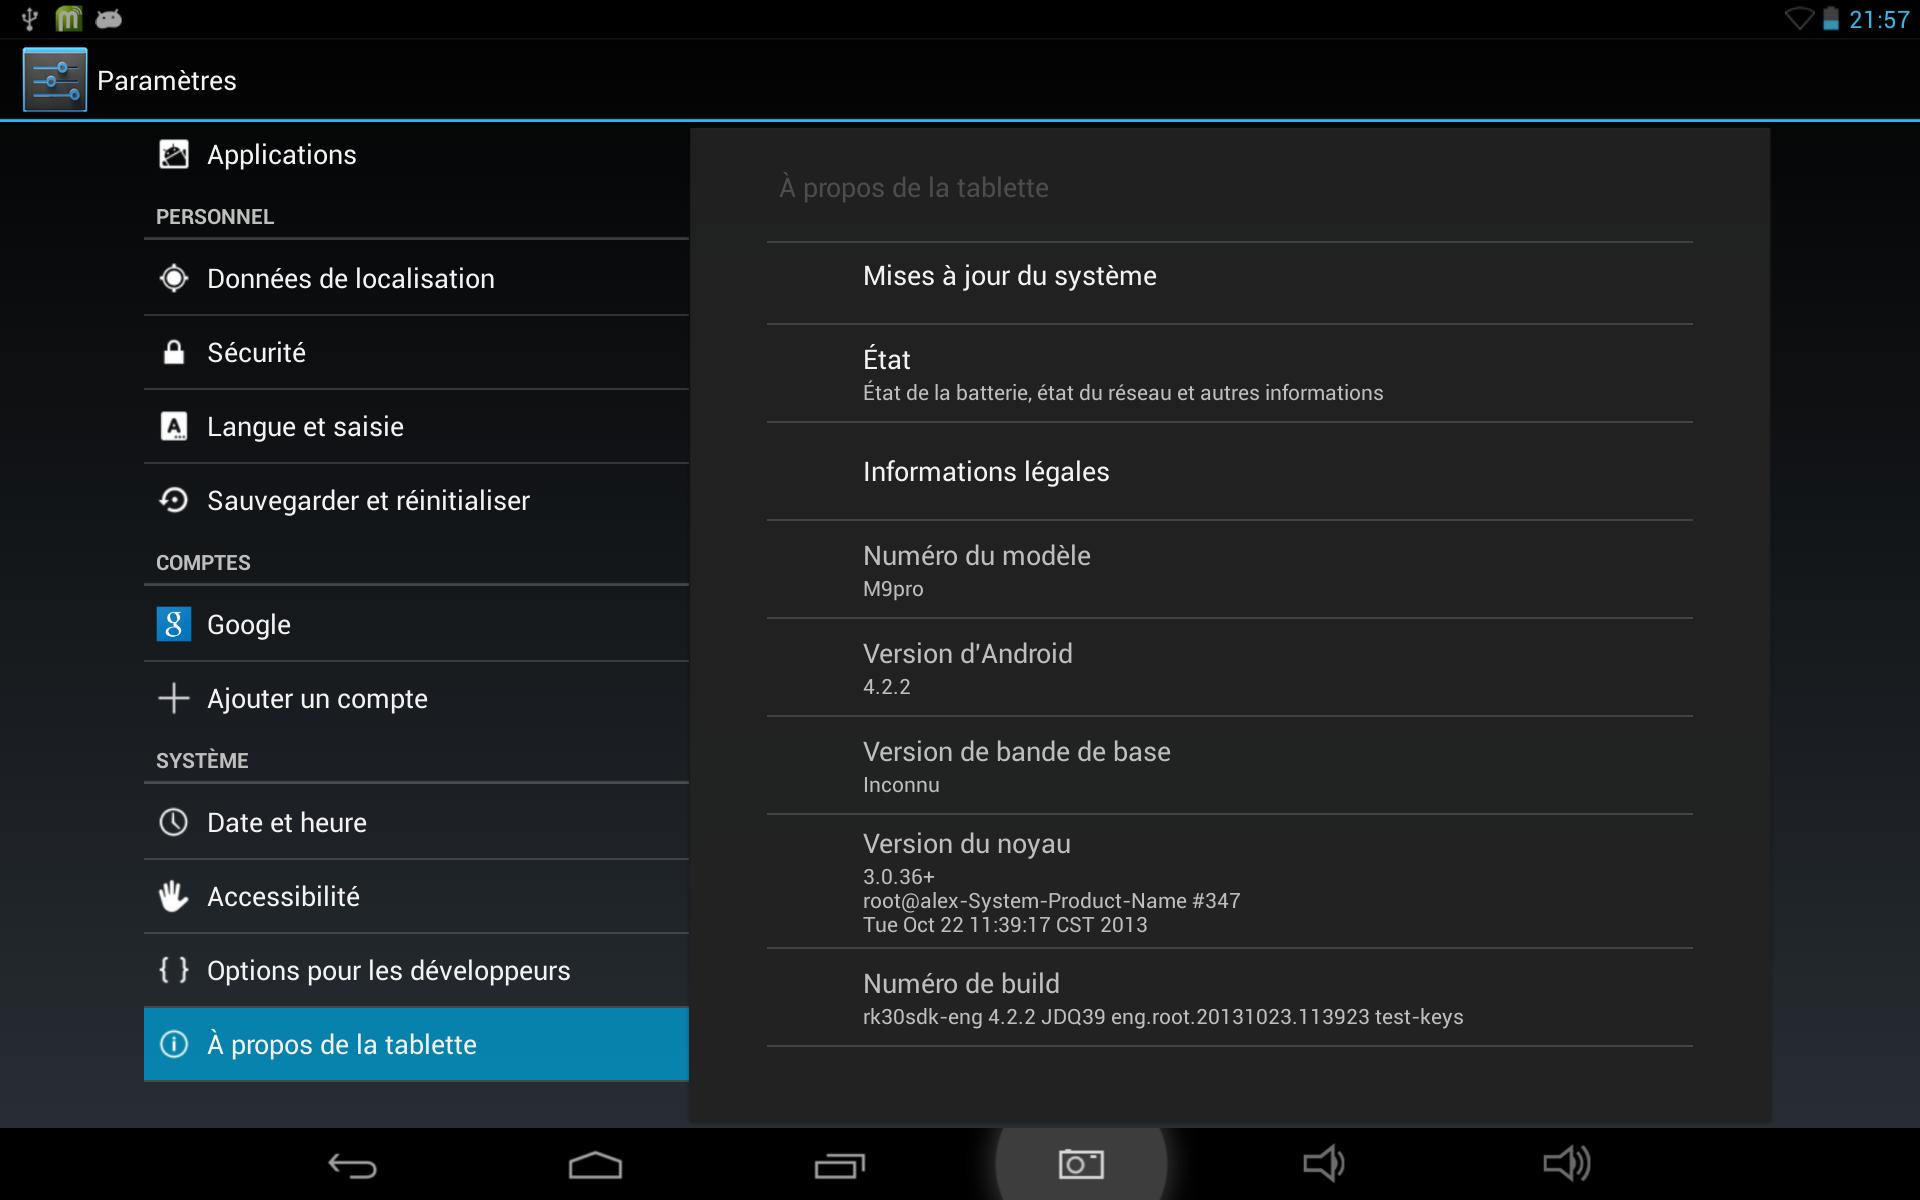 Screenshot_2013-10-25-21-57-11.png